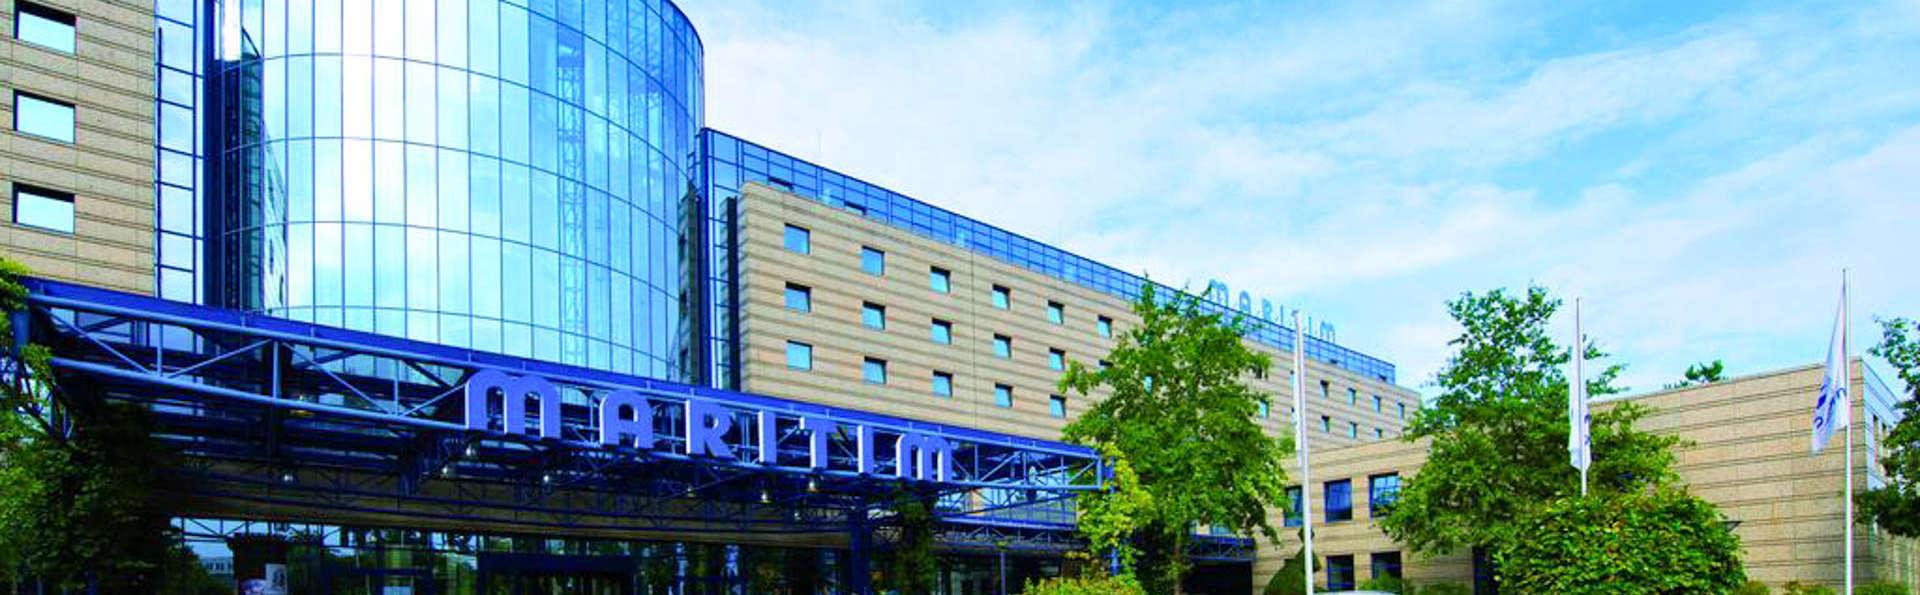 Maritim Hotel Bonn - EDIT_WEB_FRONT3.jpg